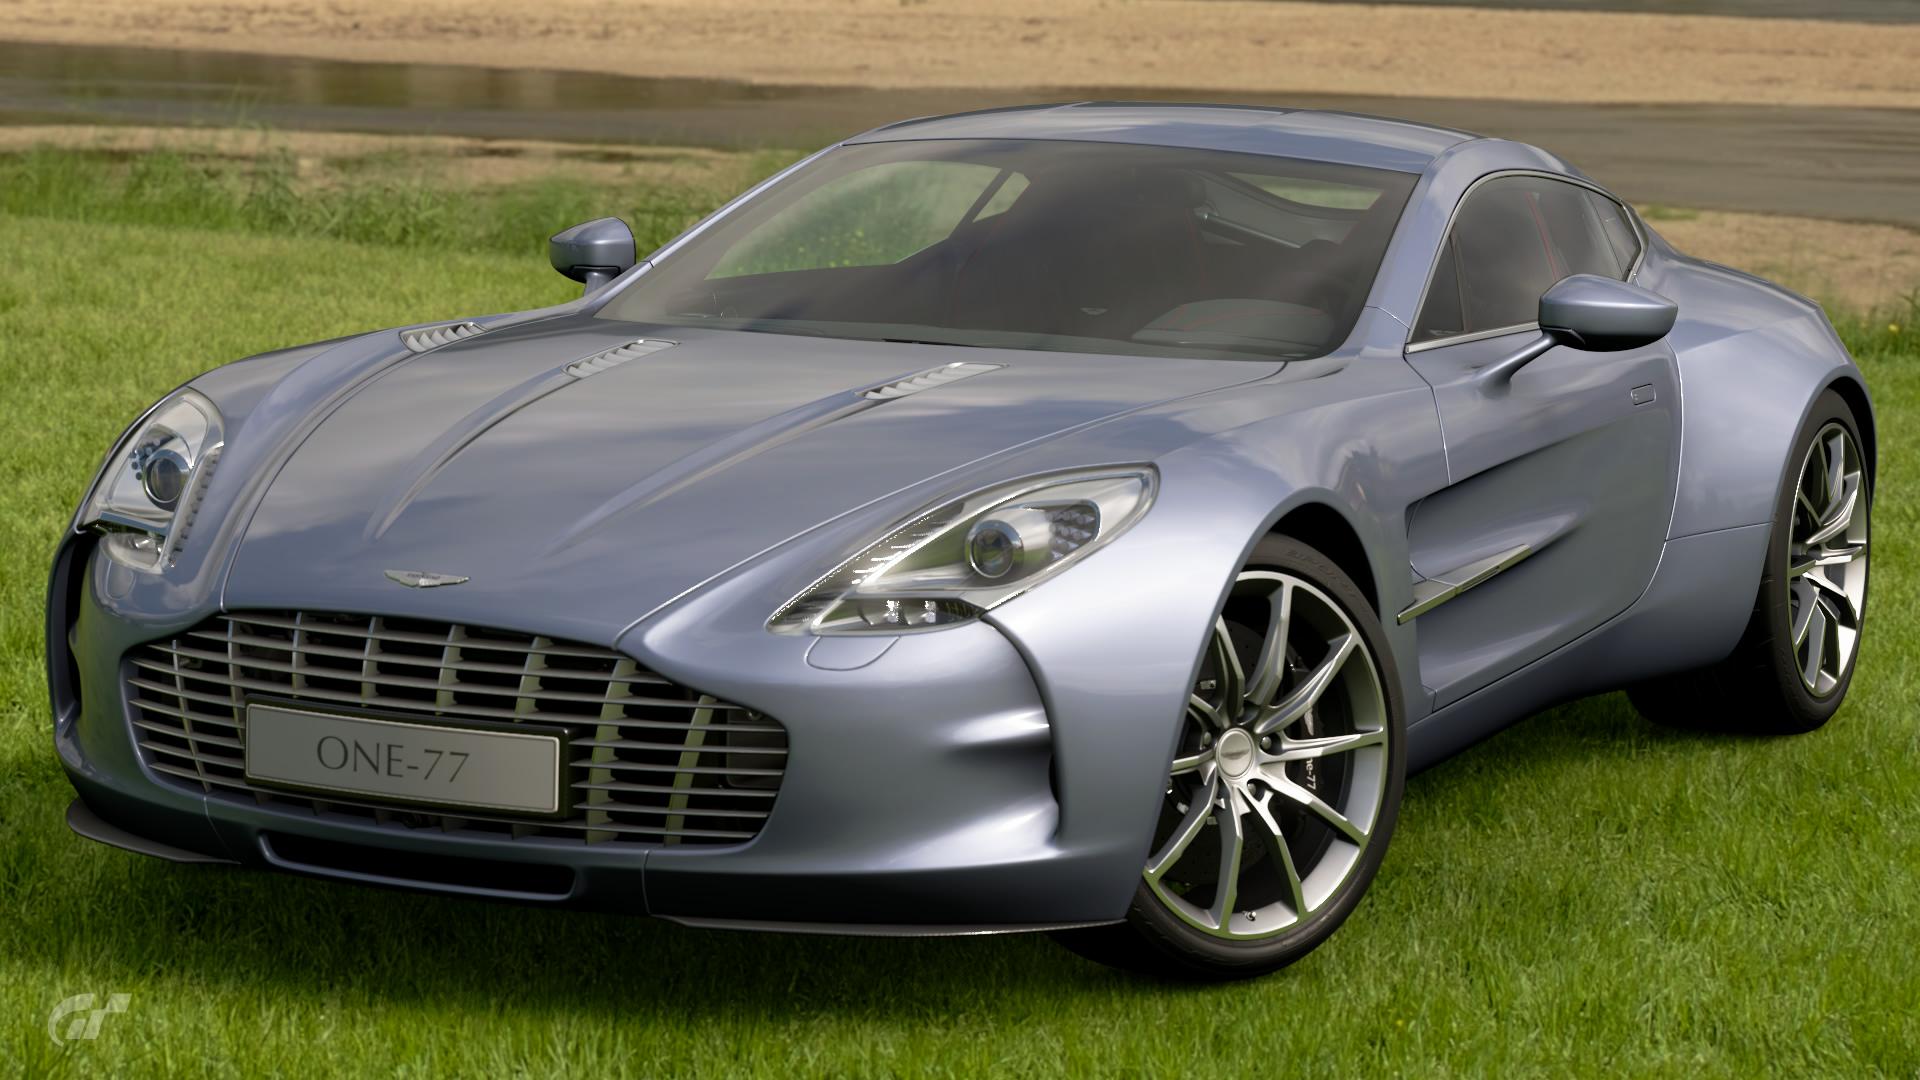 Aston martin one 77 11 gran turismo wiki fandom powered